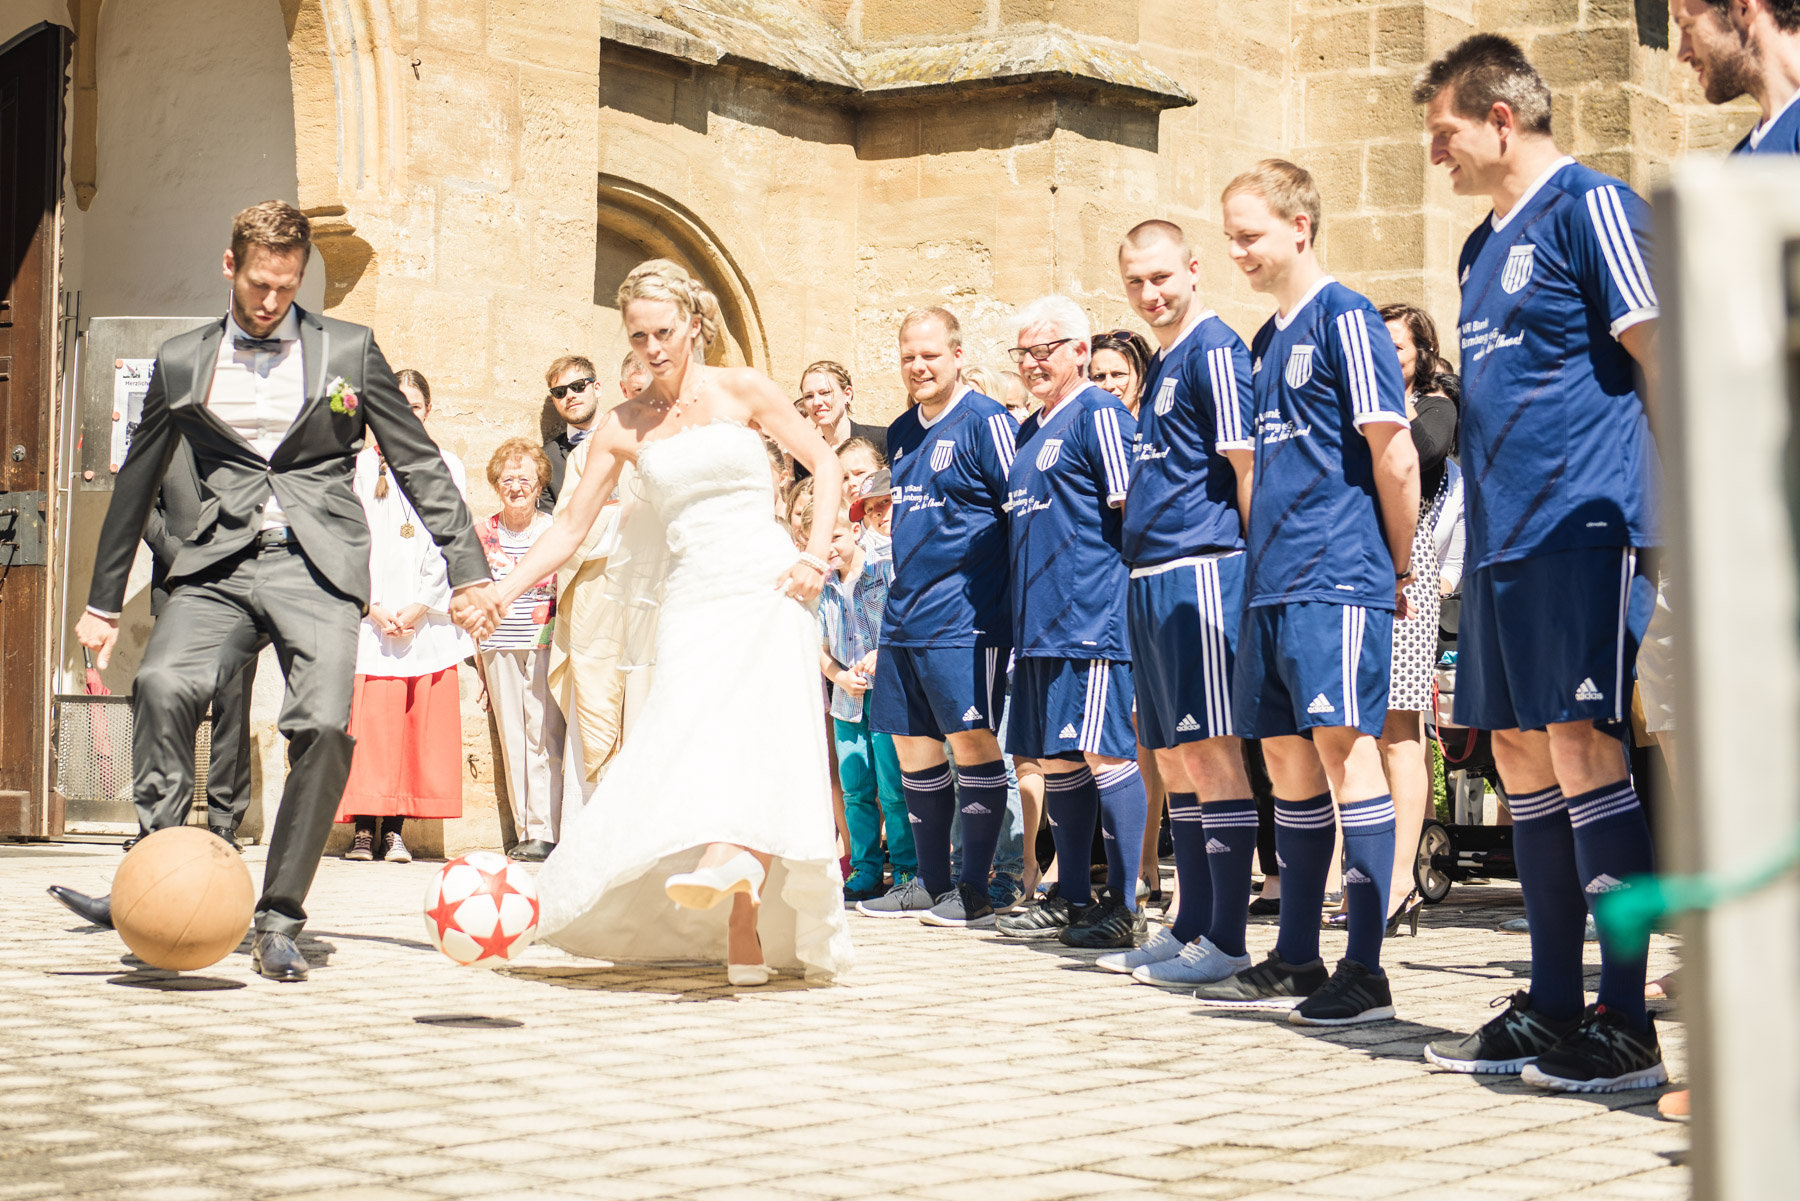 FinlyPhotography - Hochzeitsfotograf Bamberg